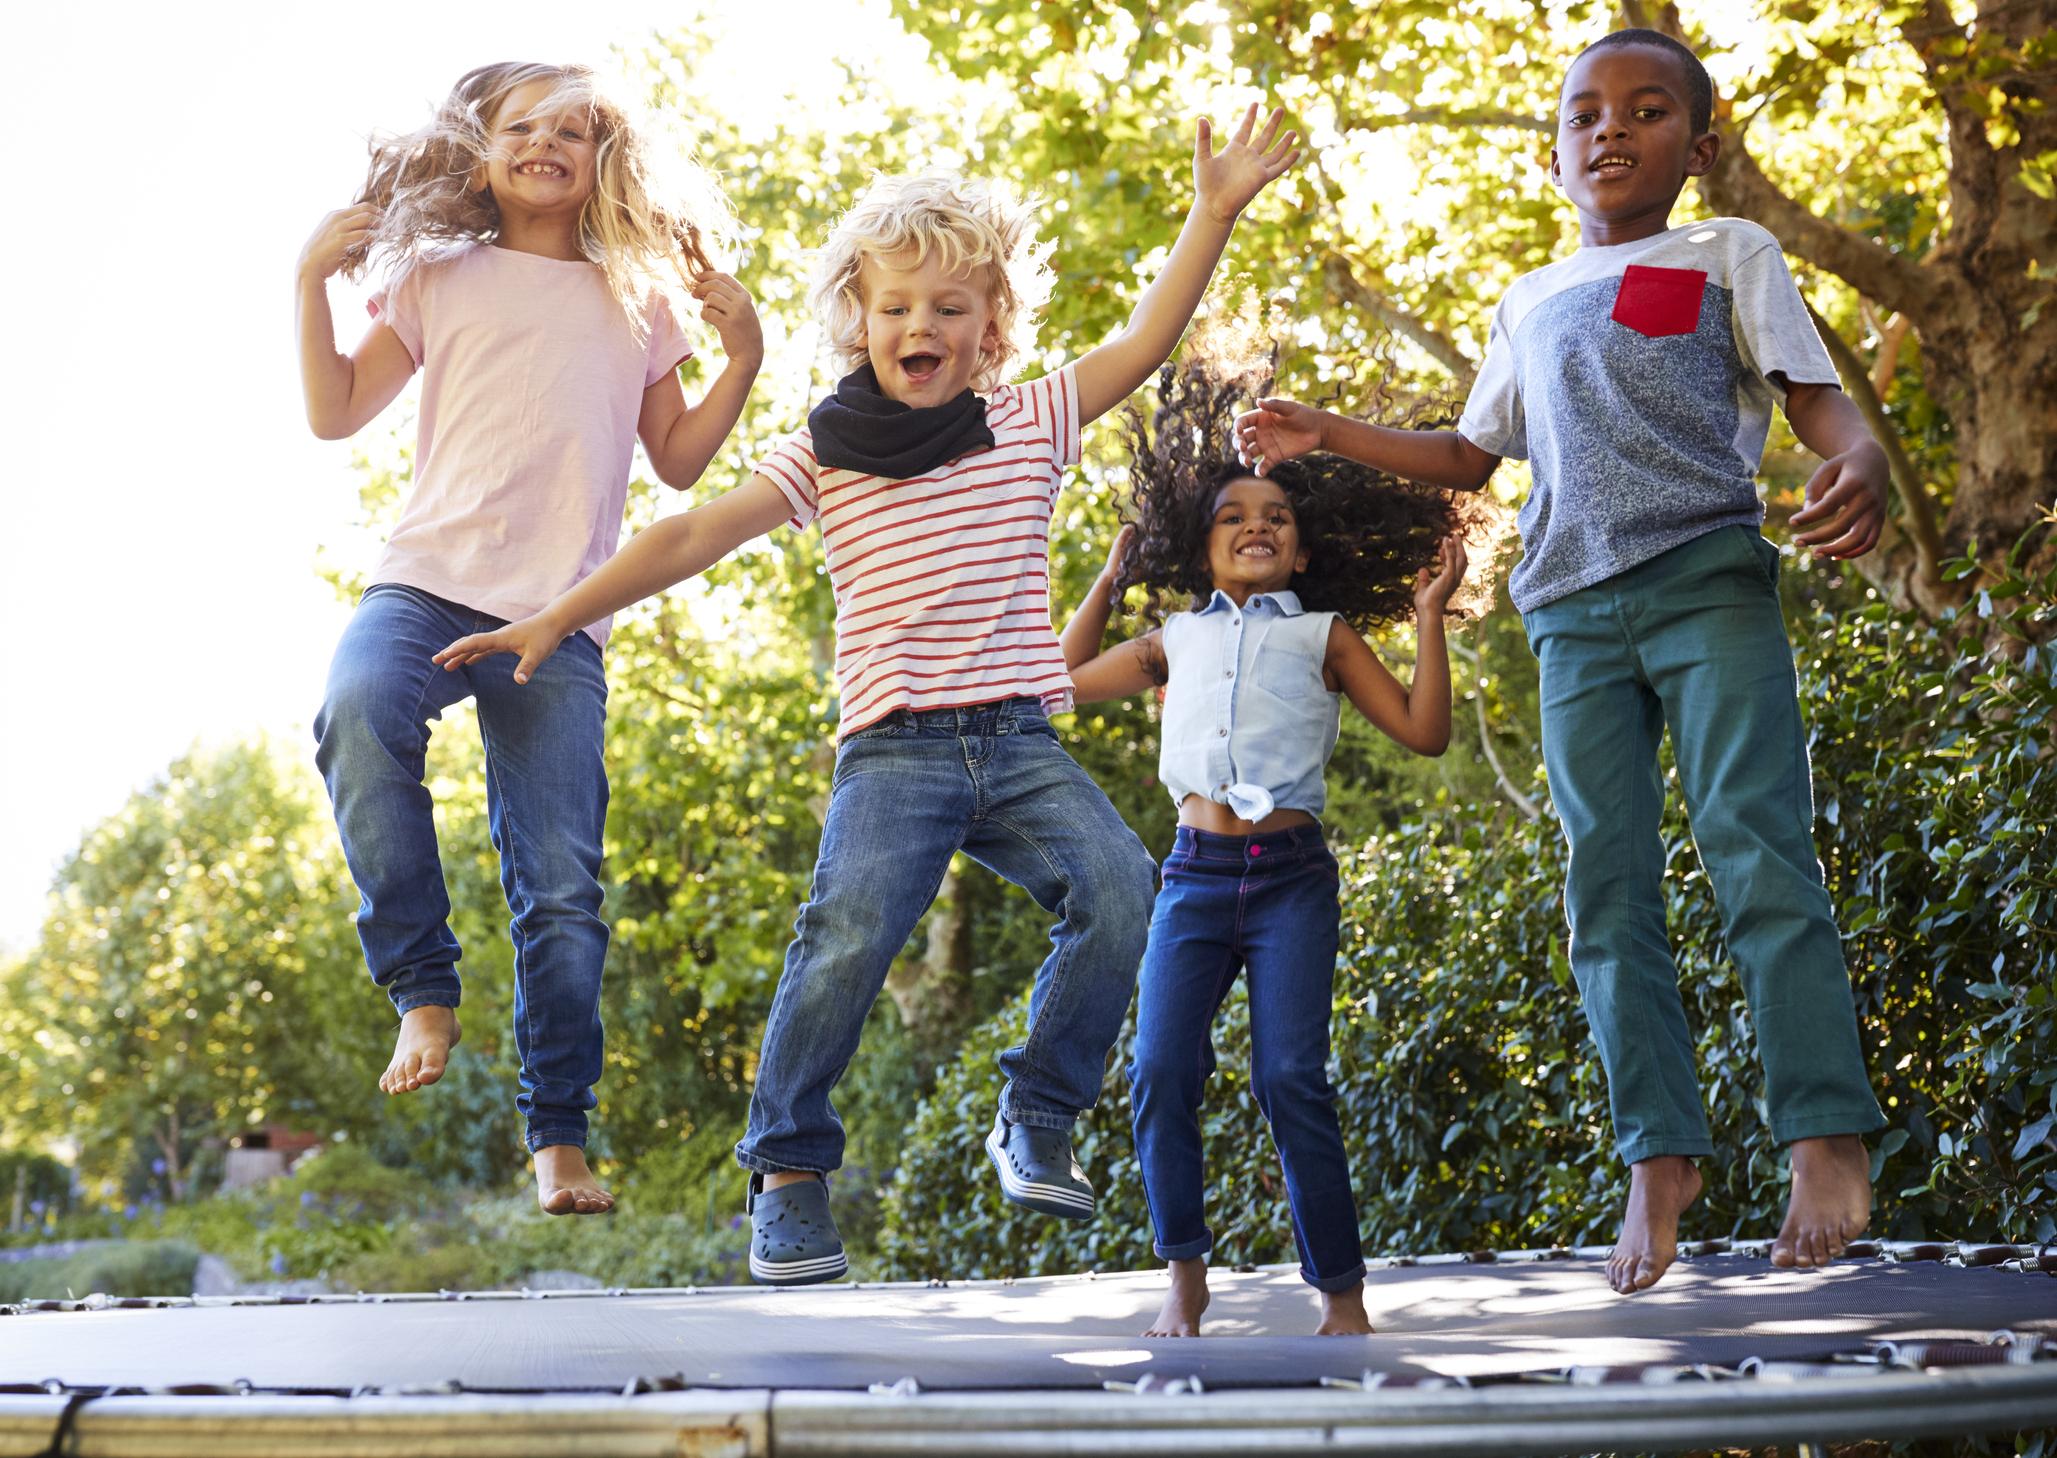 Four kids on a trampoline.